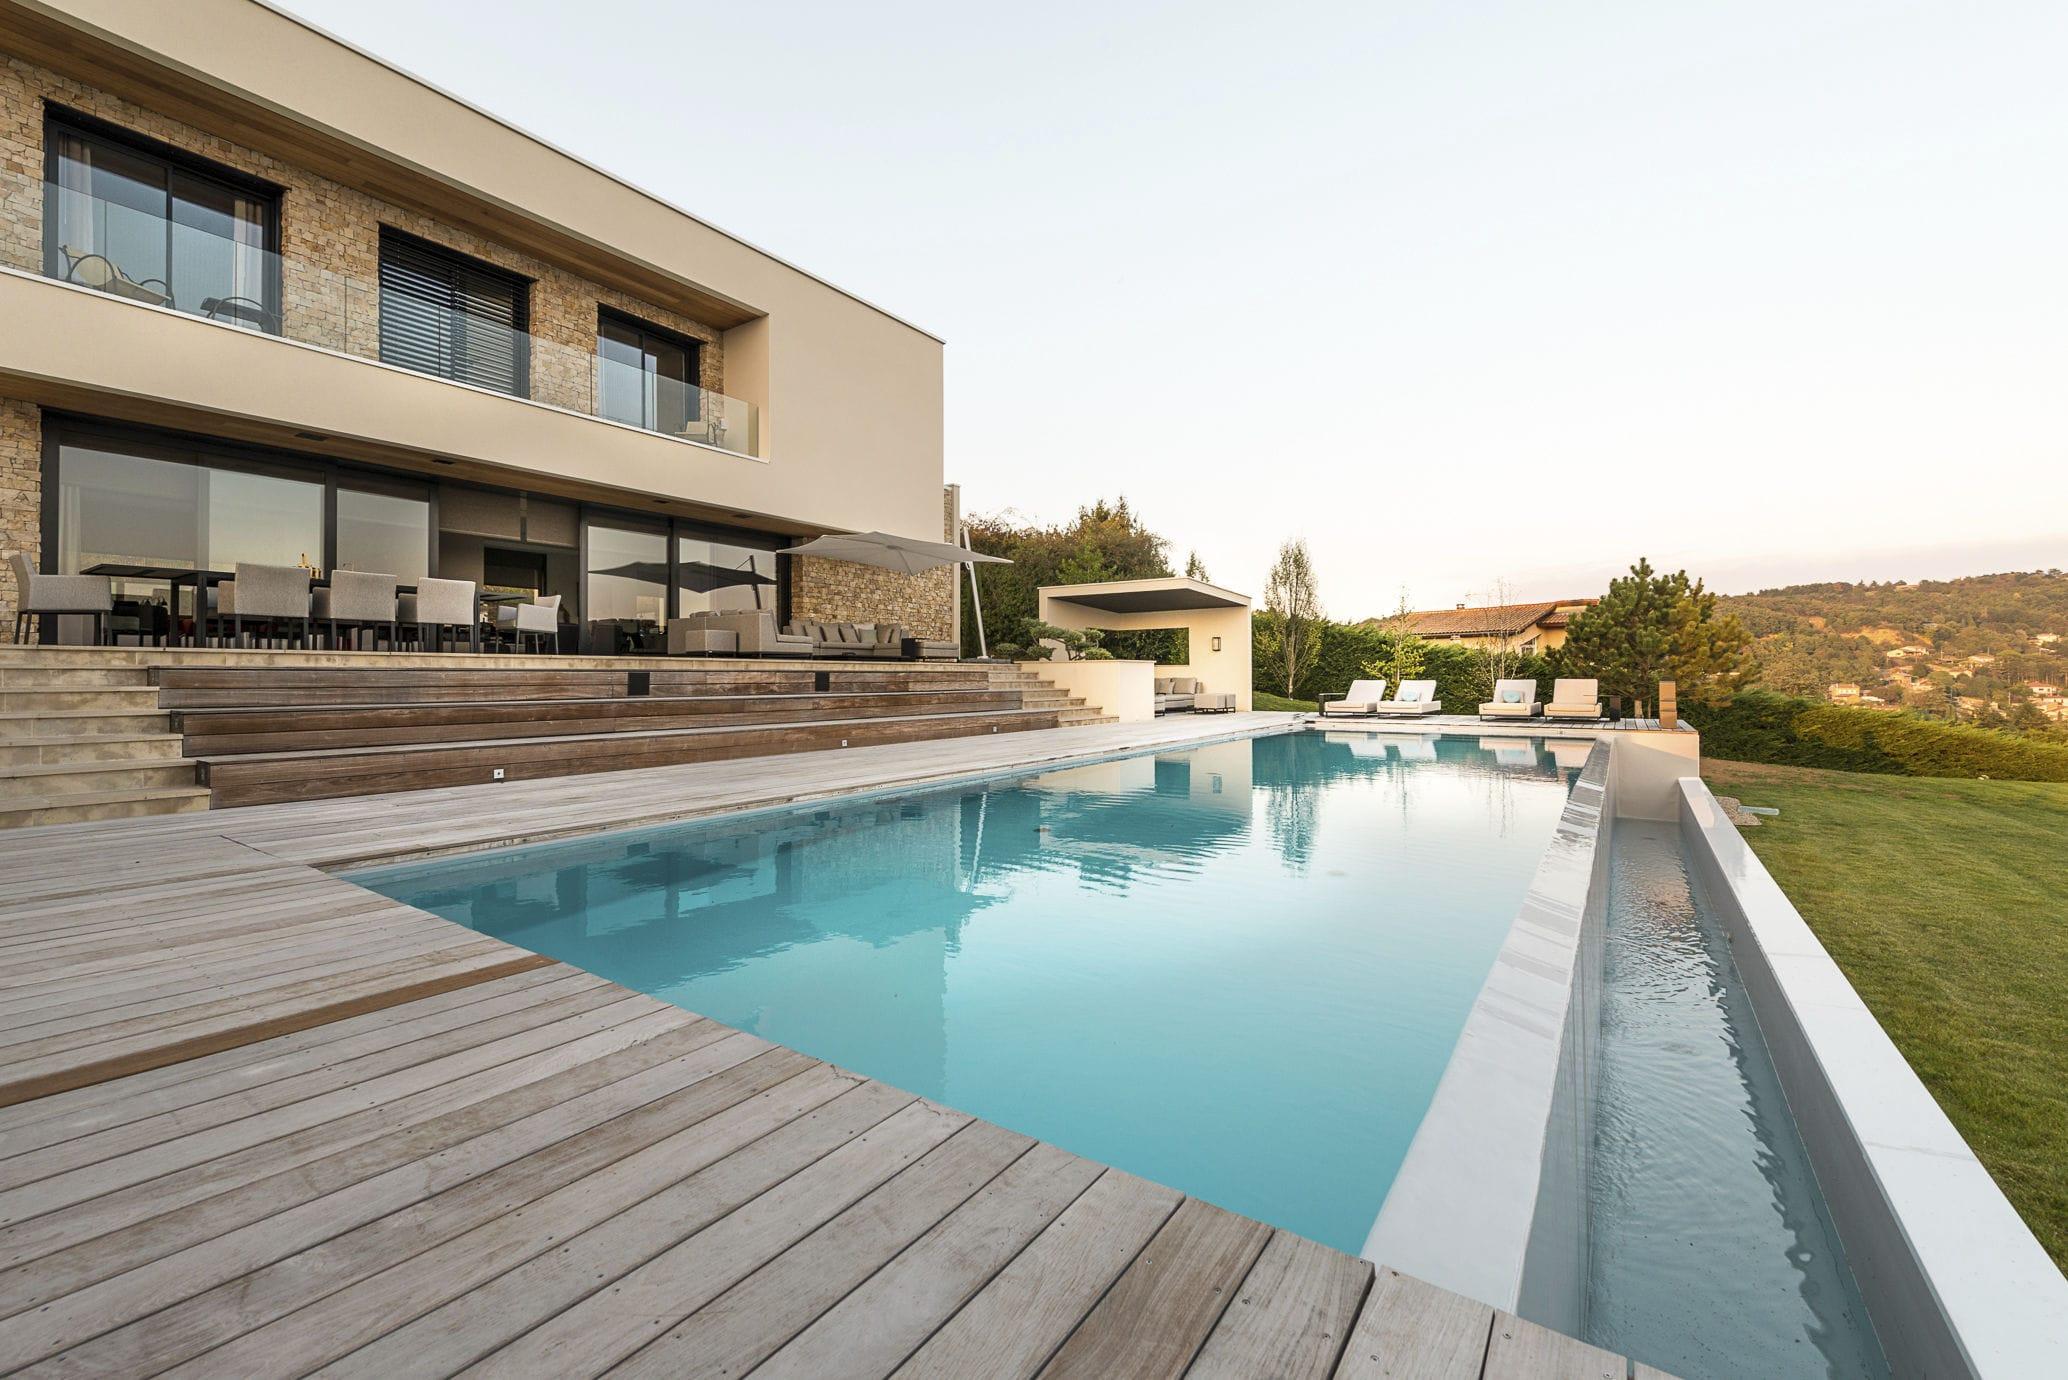 Eclairage Led Autour Piscine in-ground swimming pool / concrete / outdoor - cote jardin